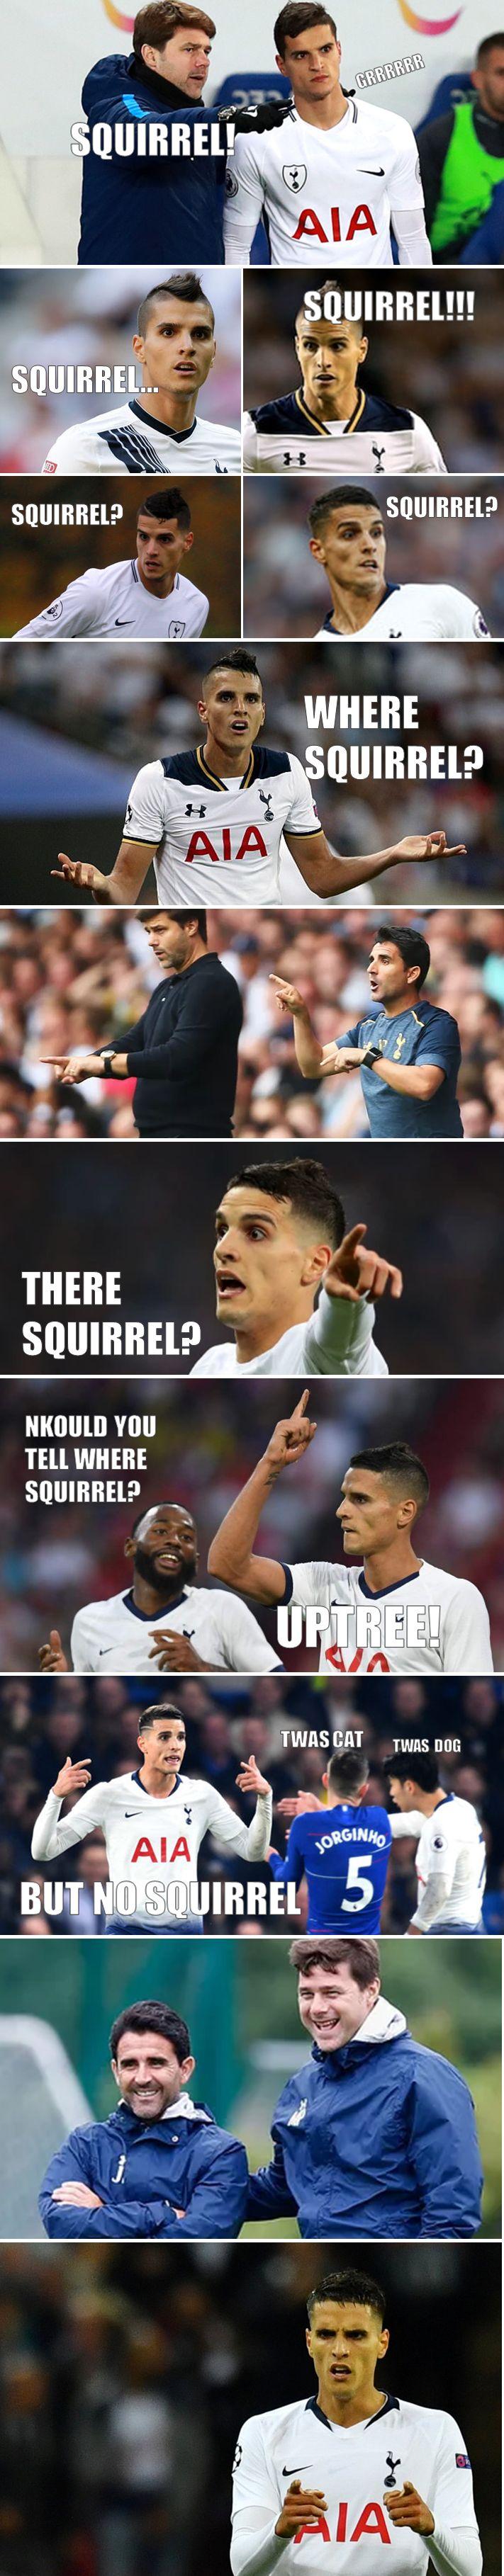 squirrel strip2.jpg